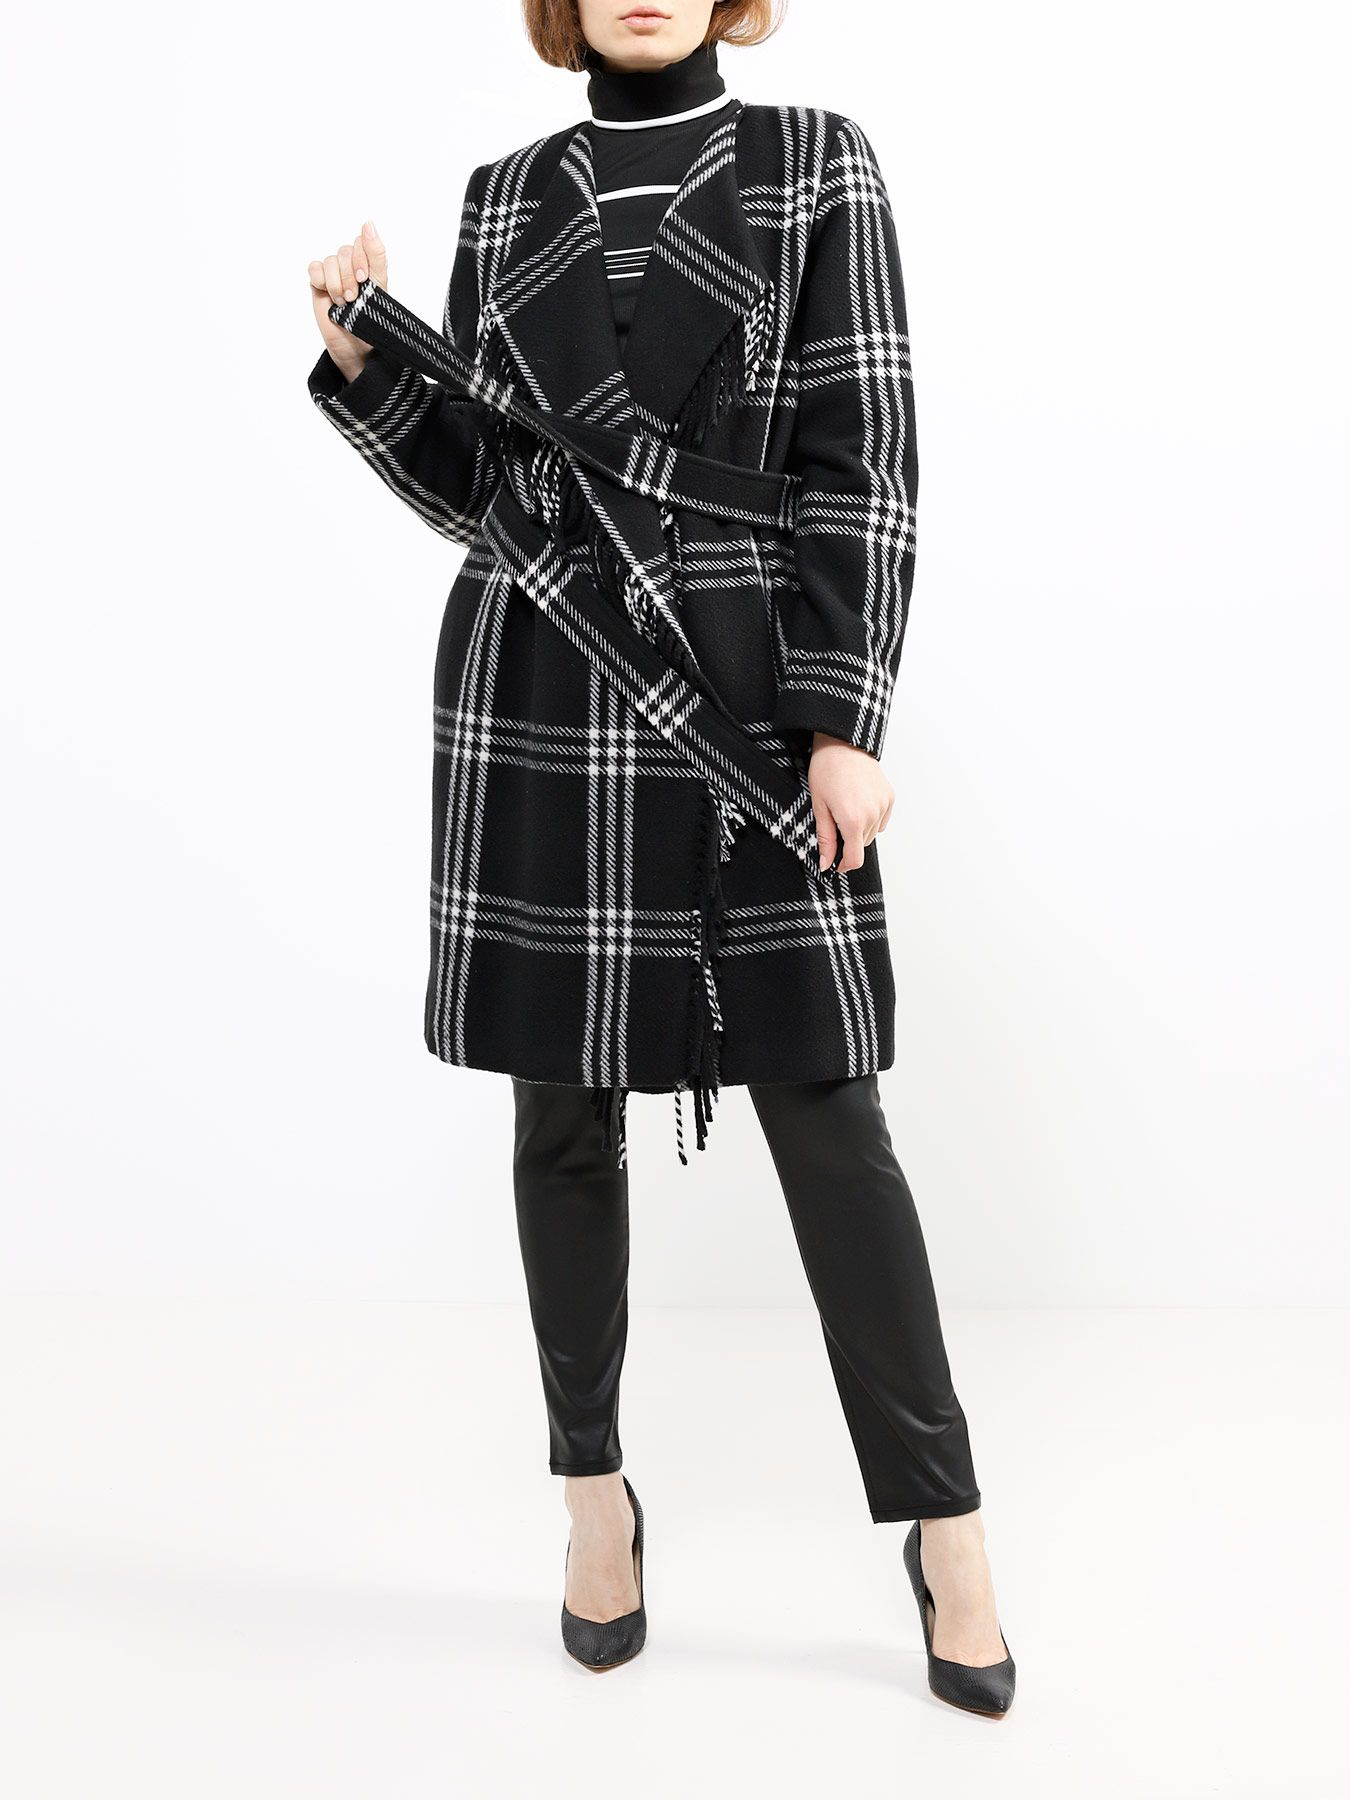 Пальто Emme Marella Пальто Dodo пальто bizzarro пальто